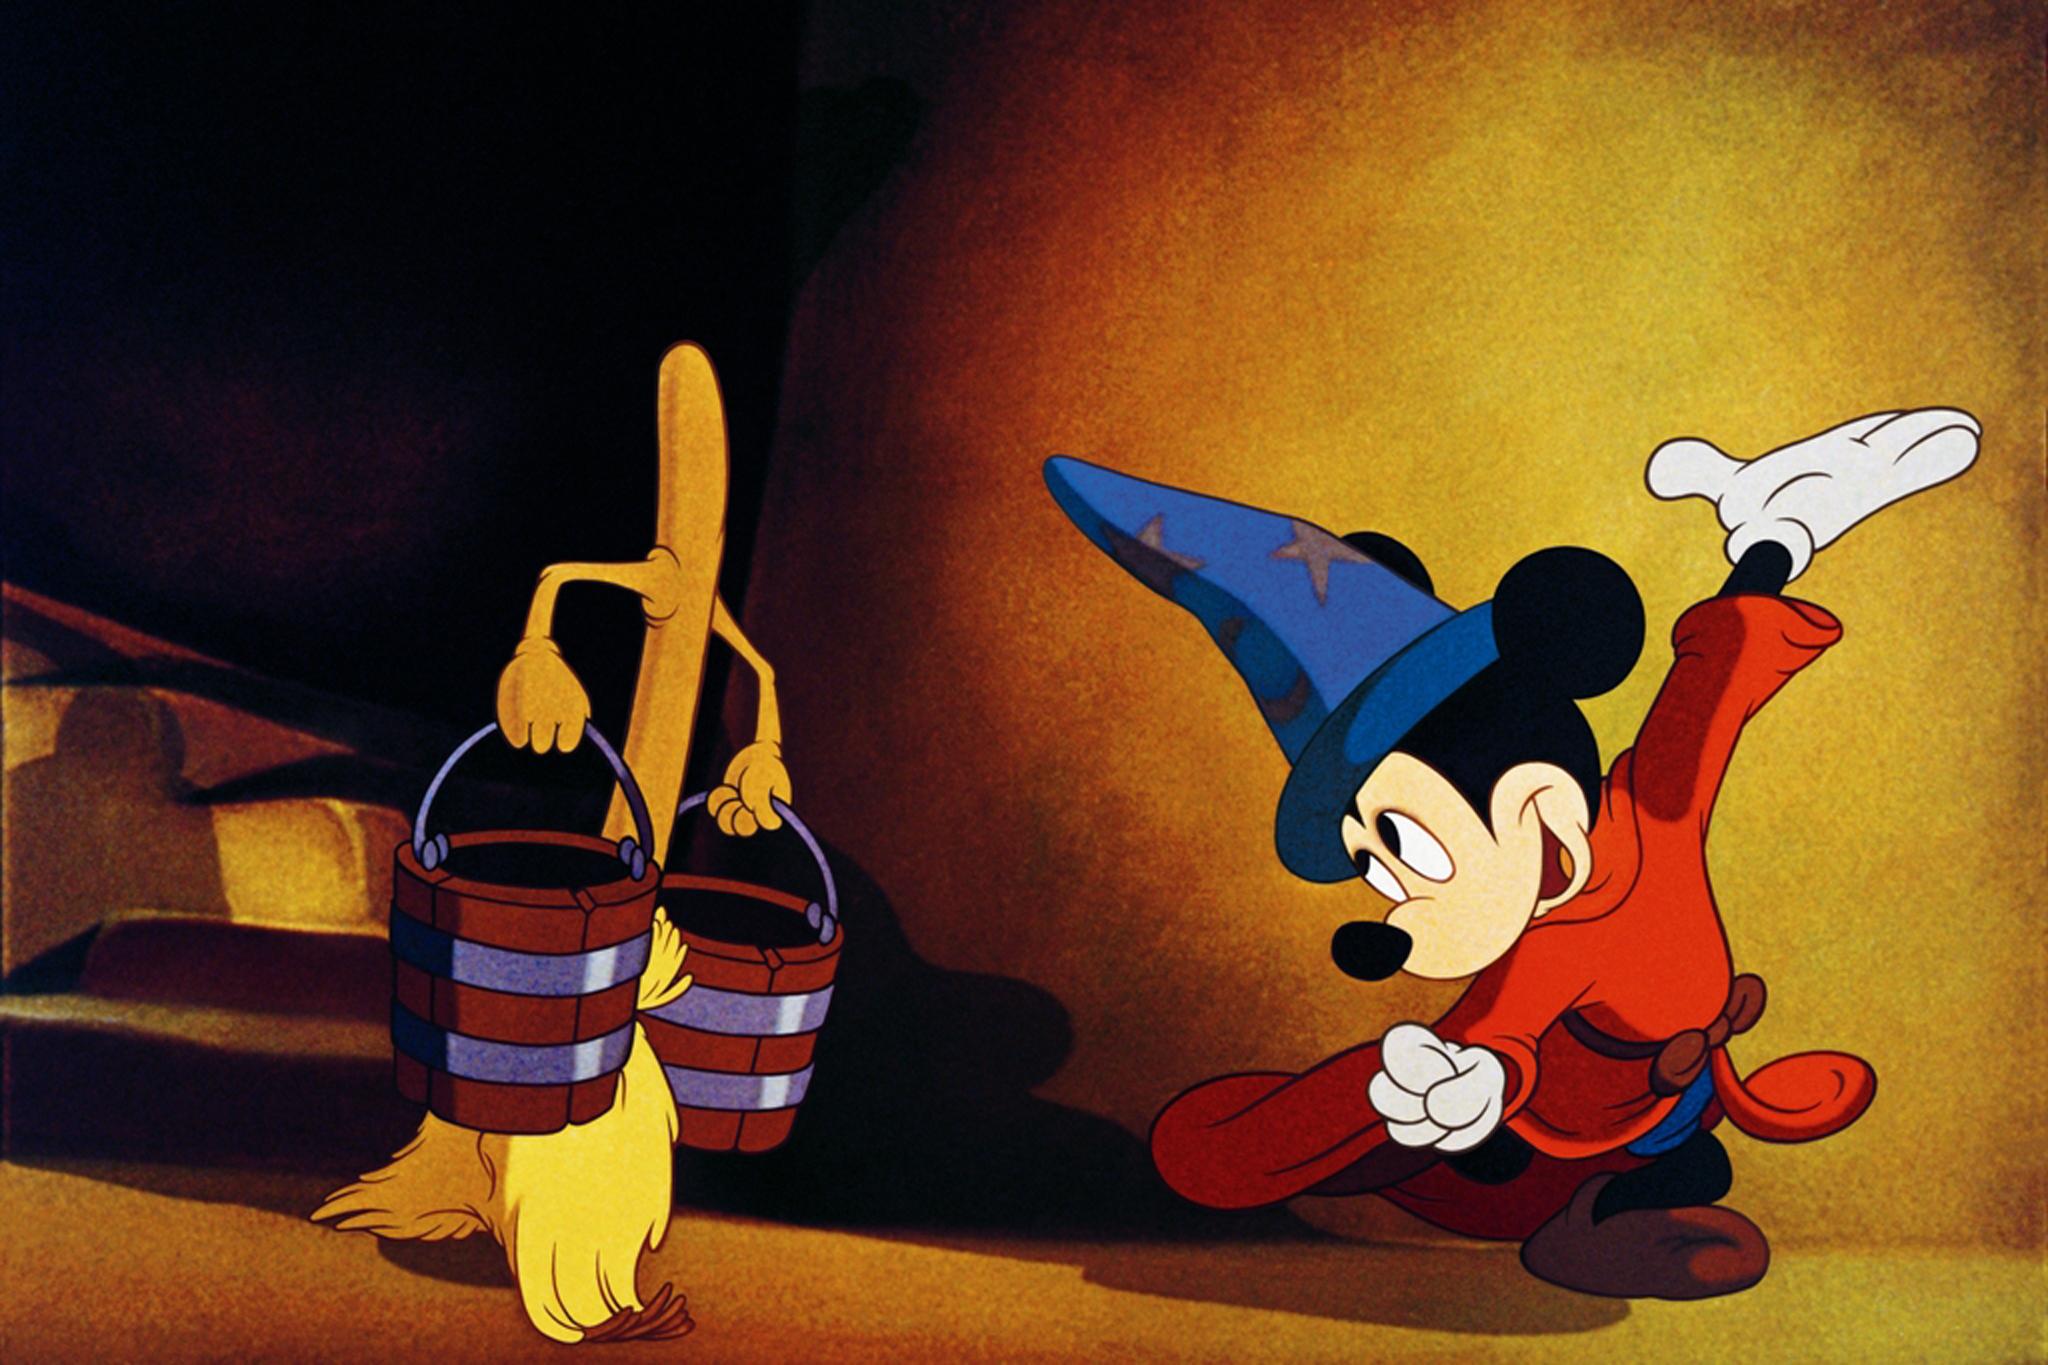 Disney Fantasia Live in Concert